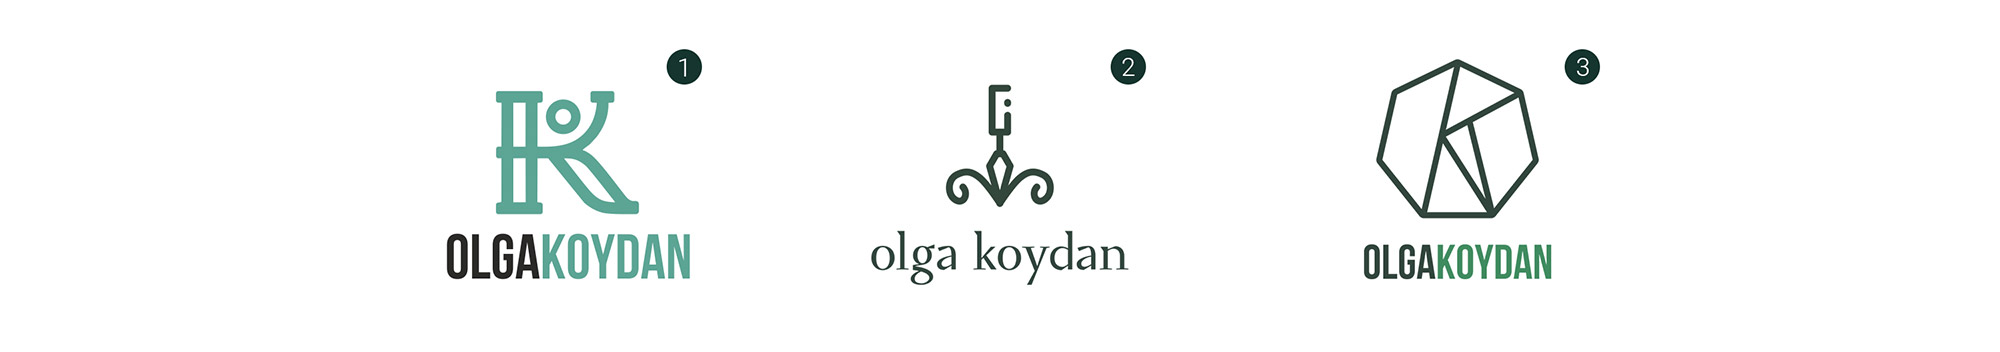 Личный бренд мастера маркетри варианты эскизов логотипа